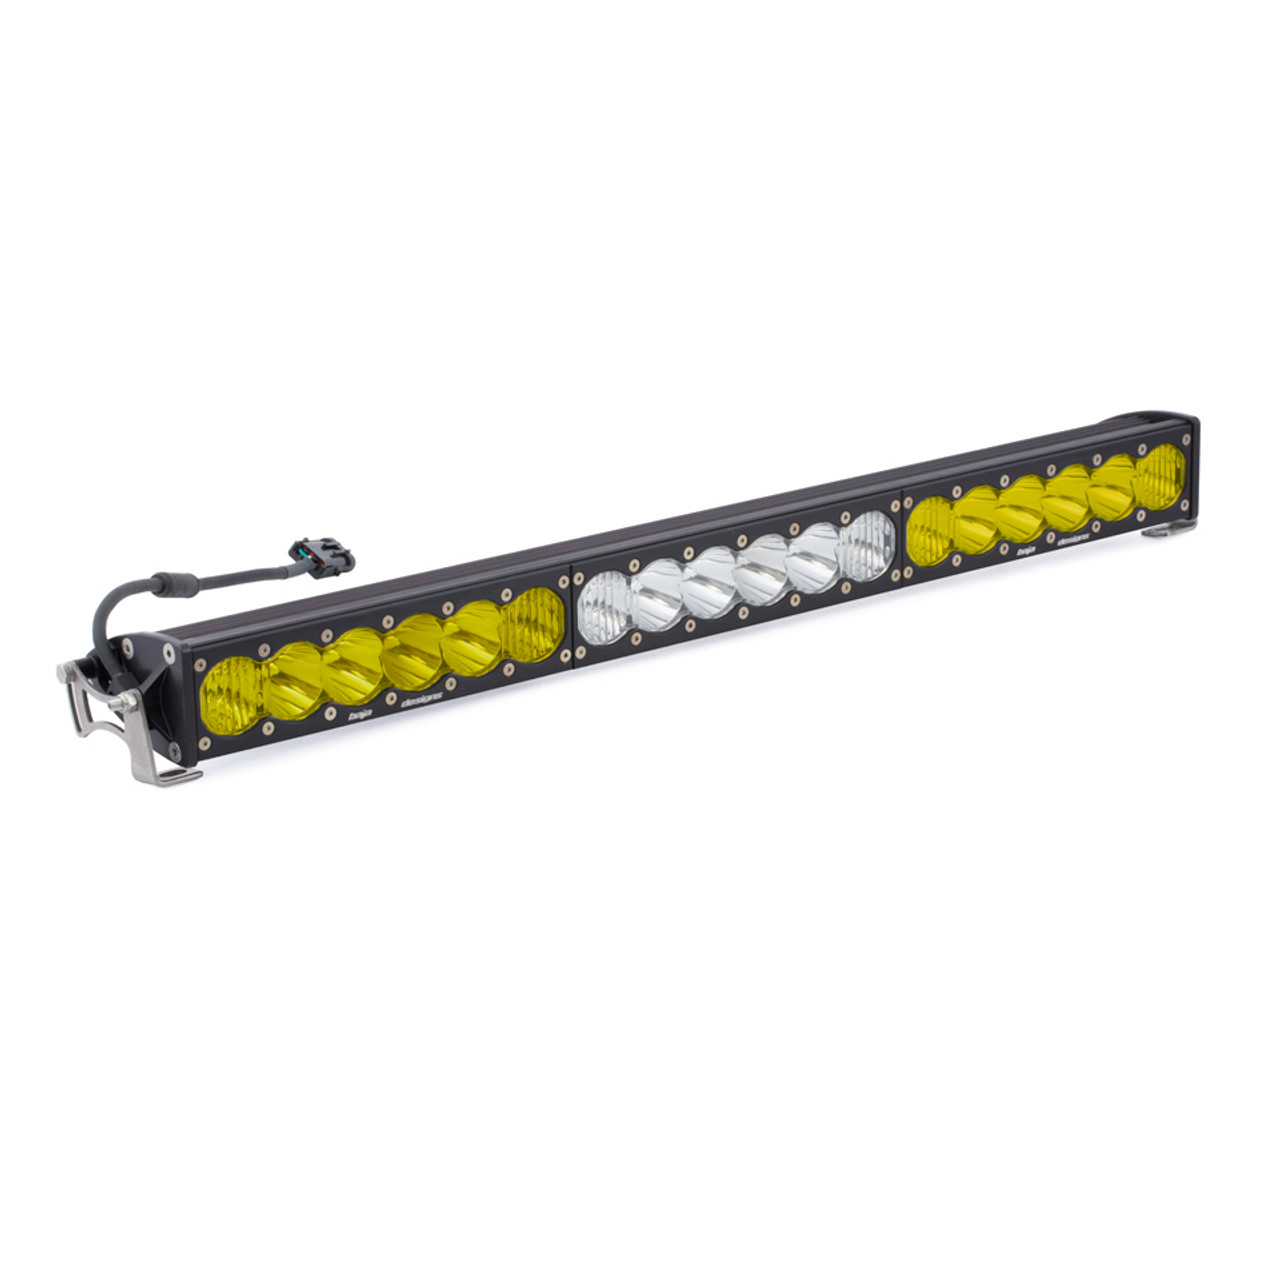 OnX6, Dual Control Amber/White LED Light Bar